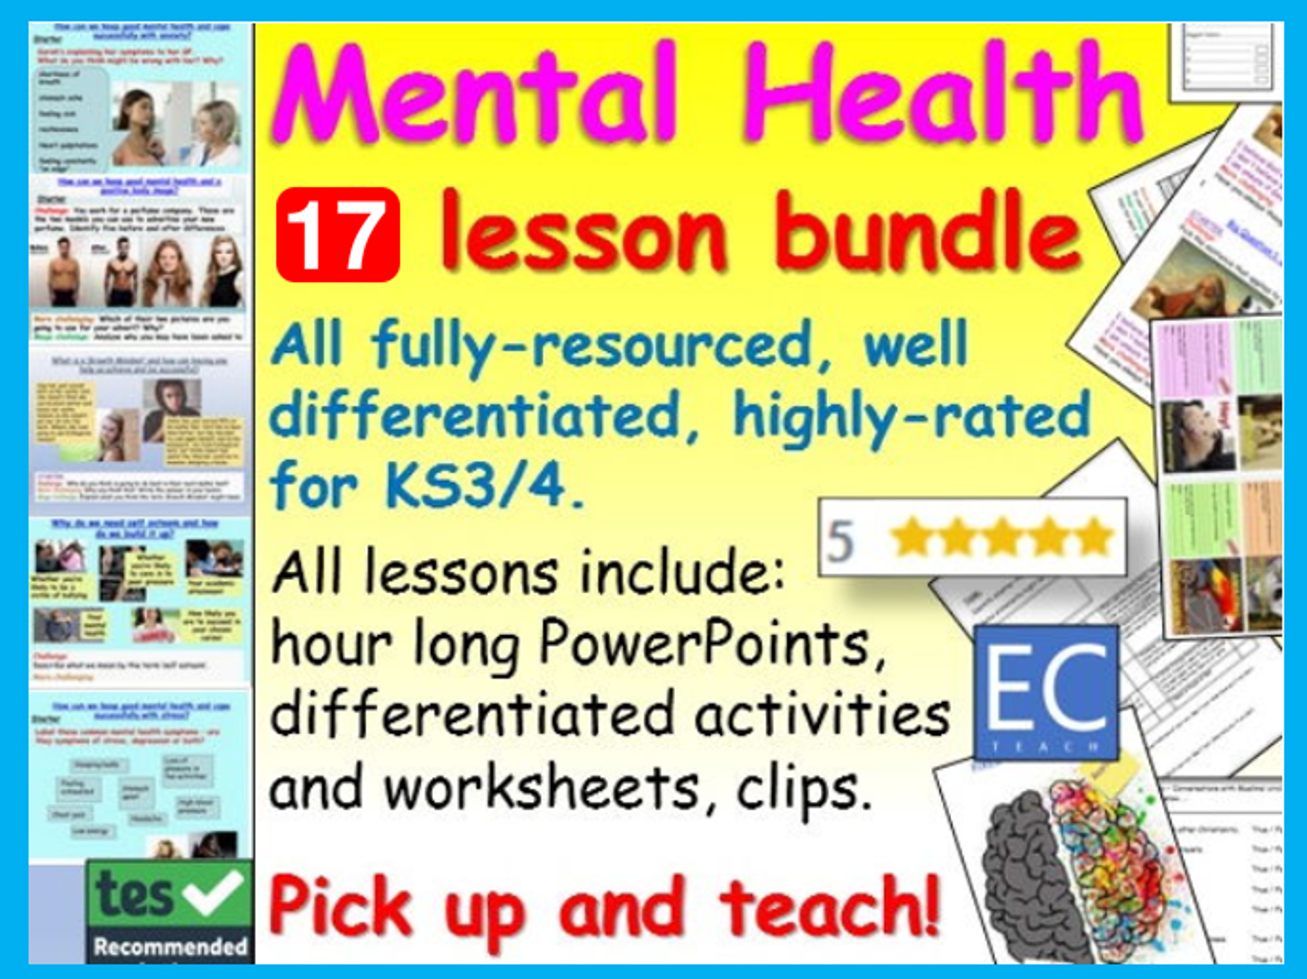 Mental Health: Mental Health Bundle